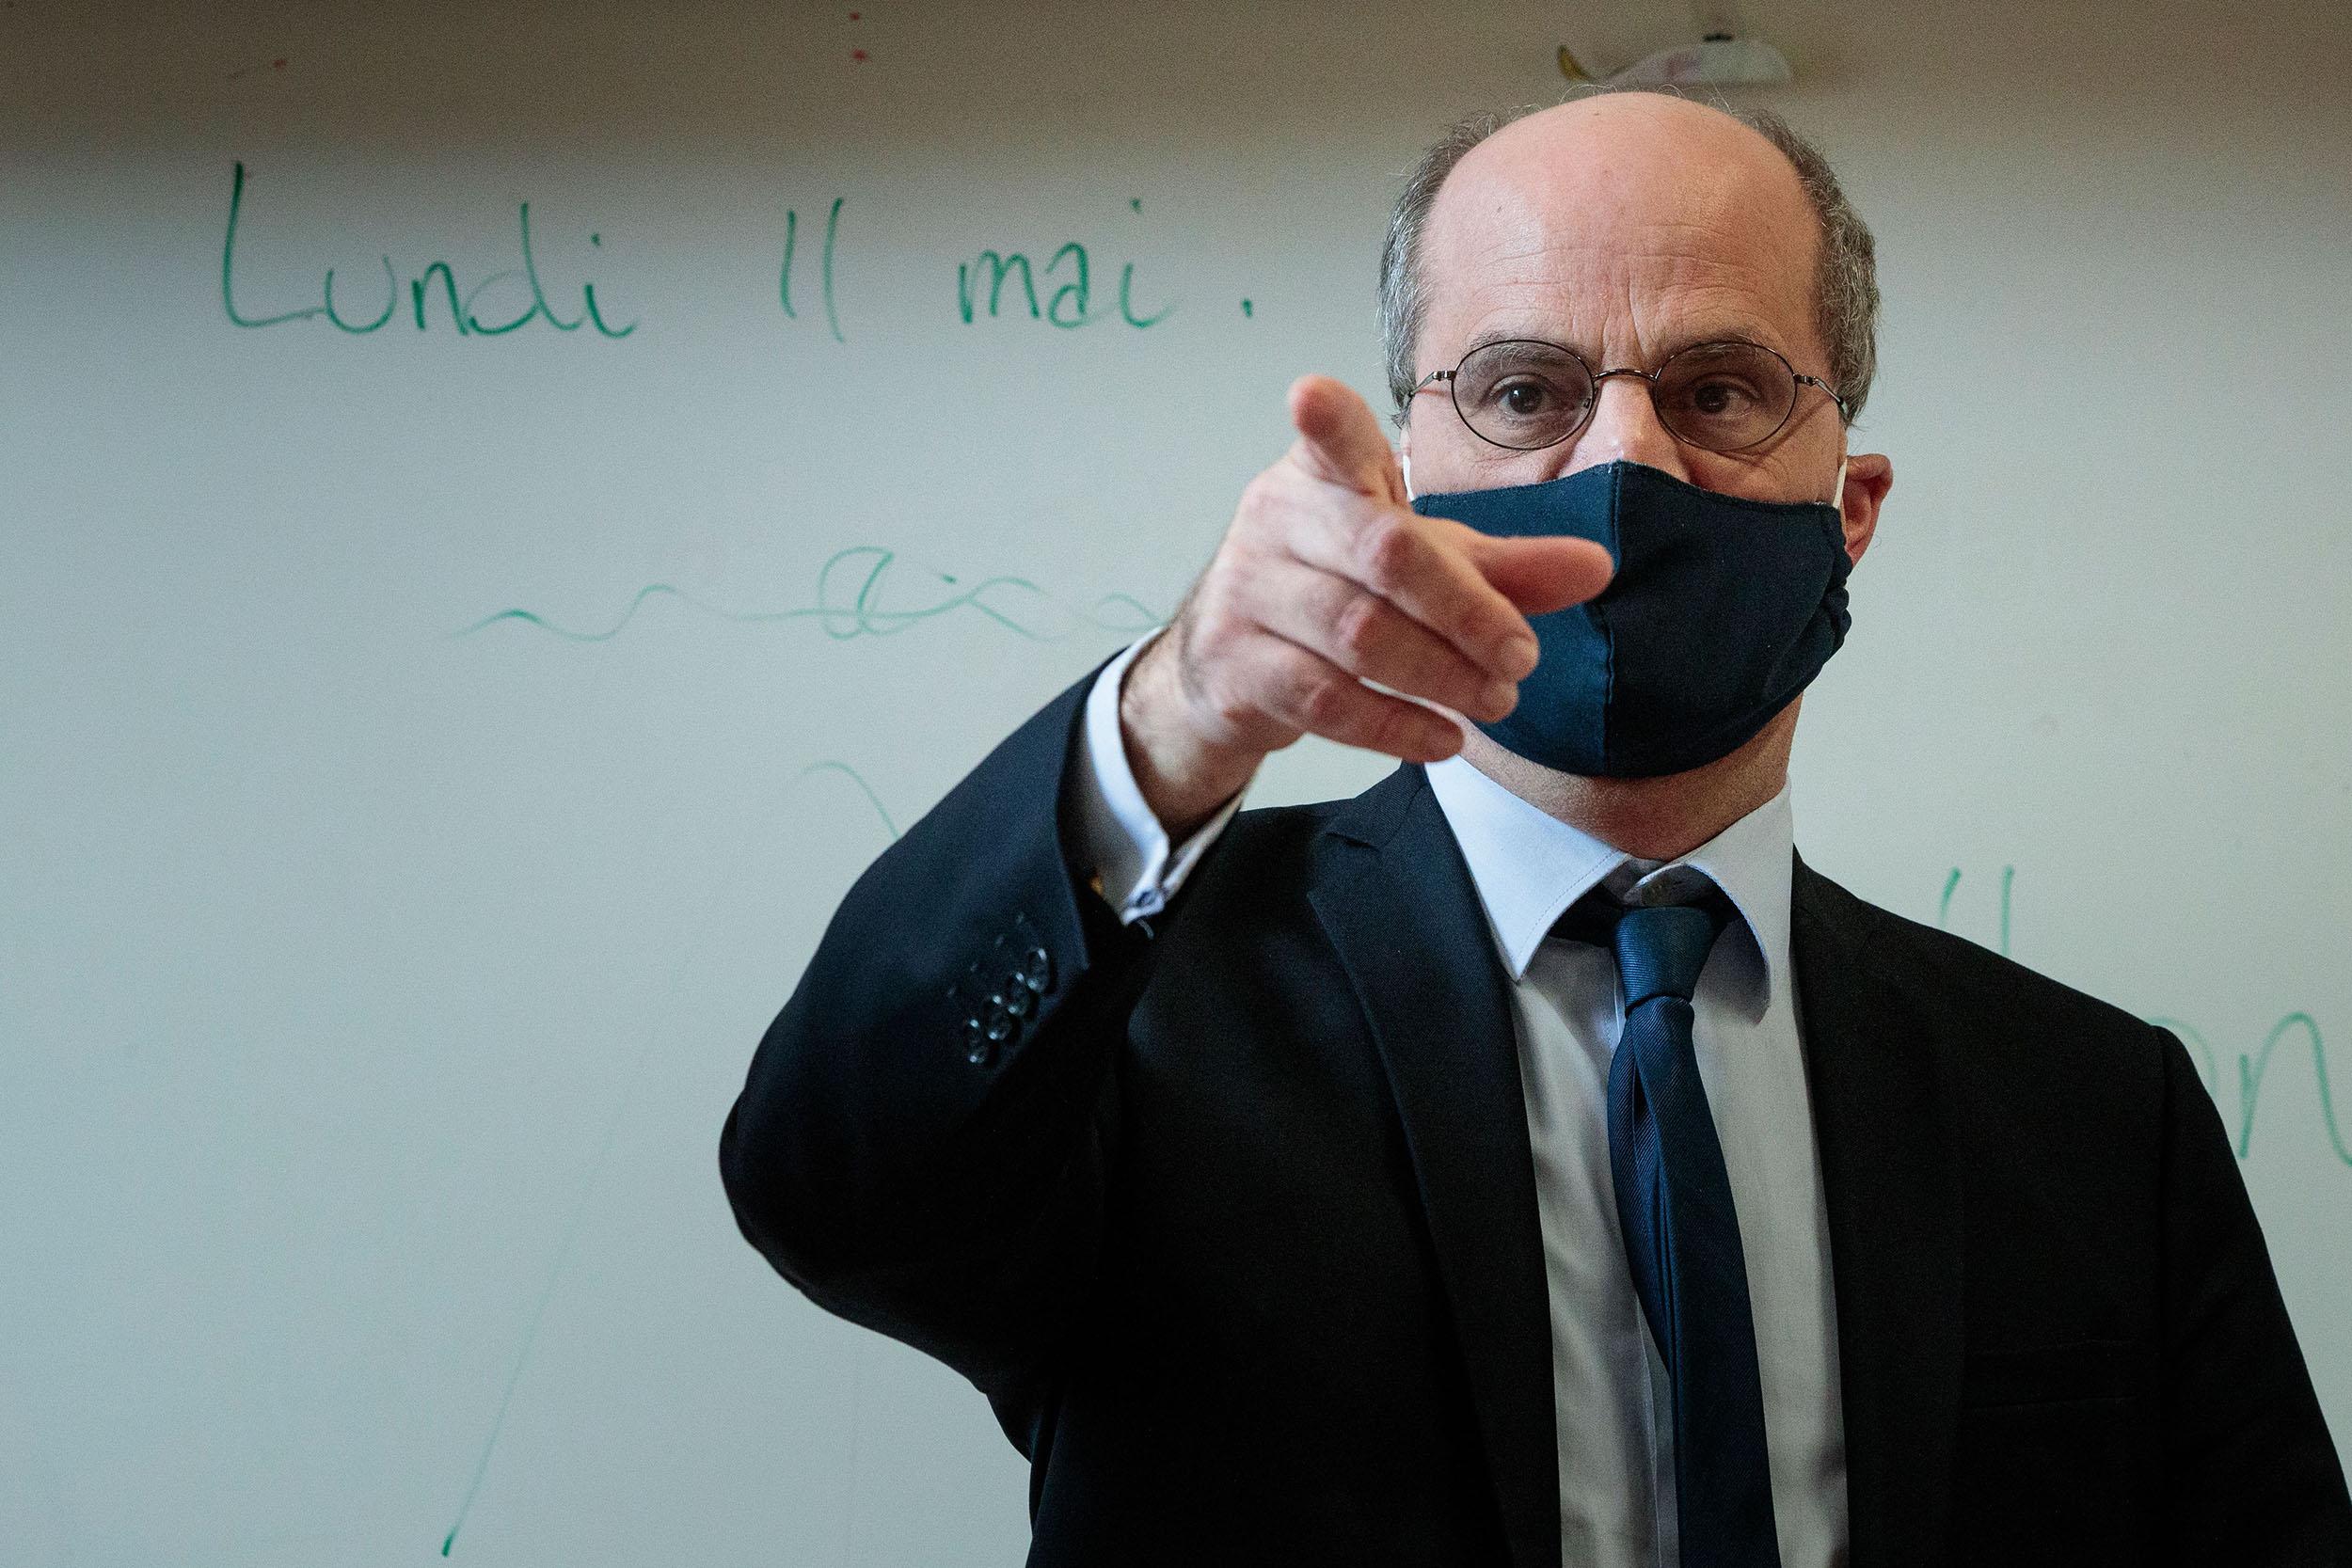 Rrikthehen rastet me koronavirus, Franca mbyll 70 shkolla